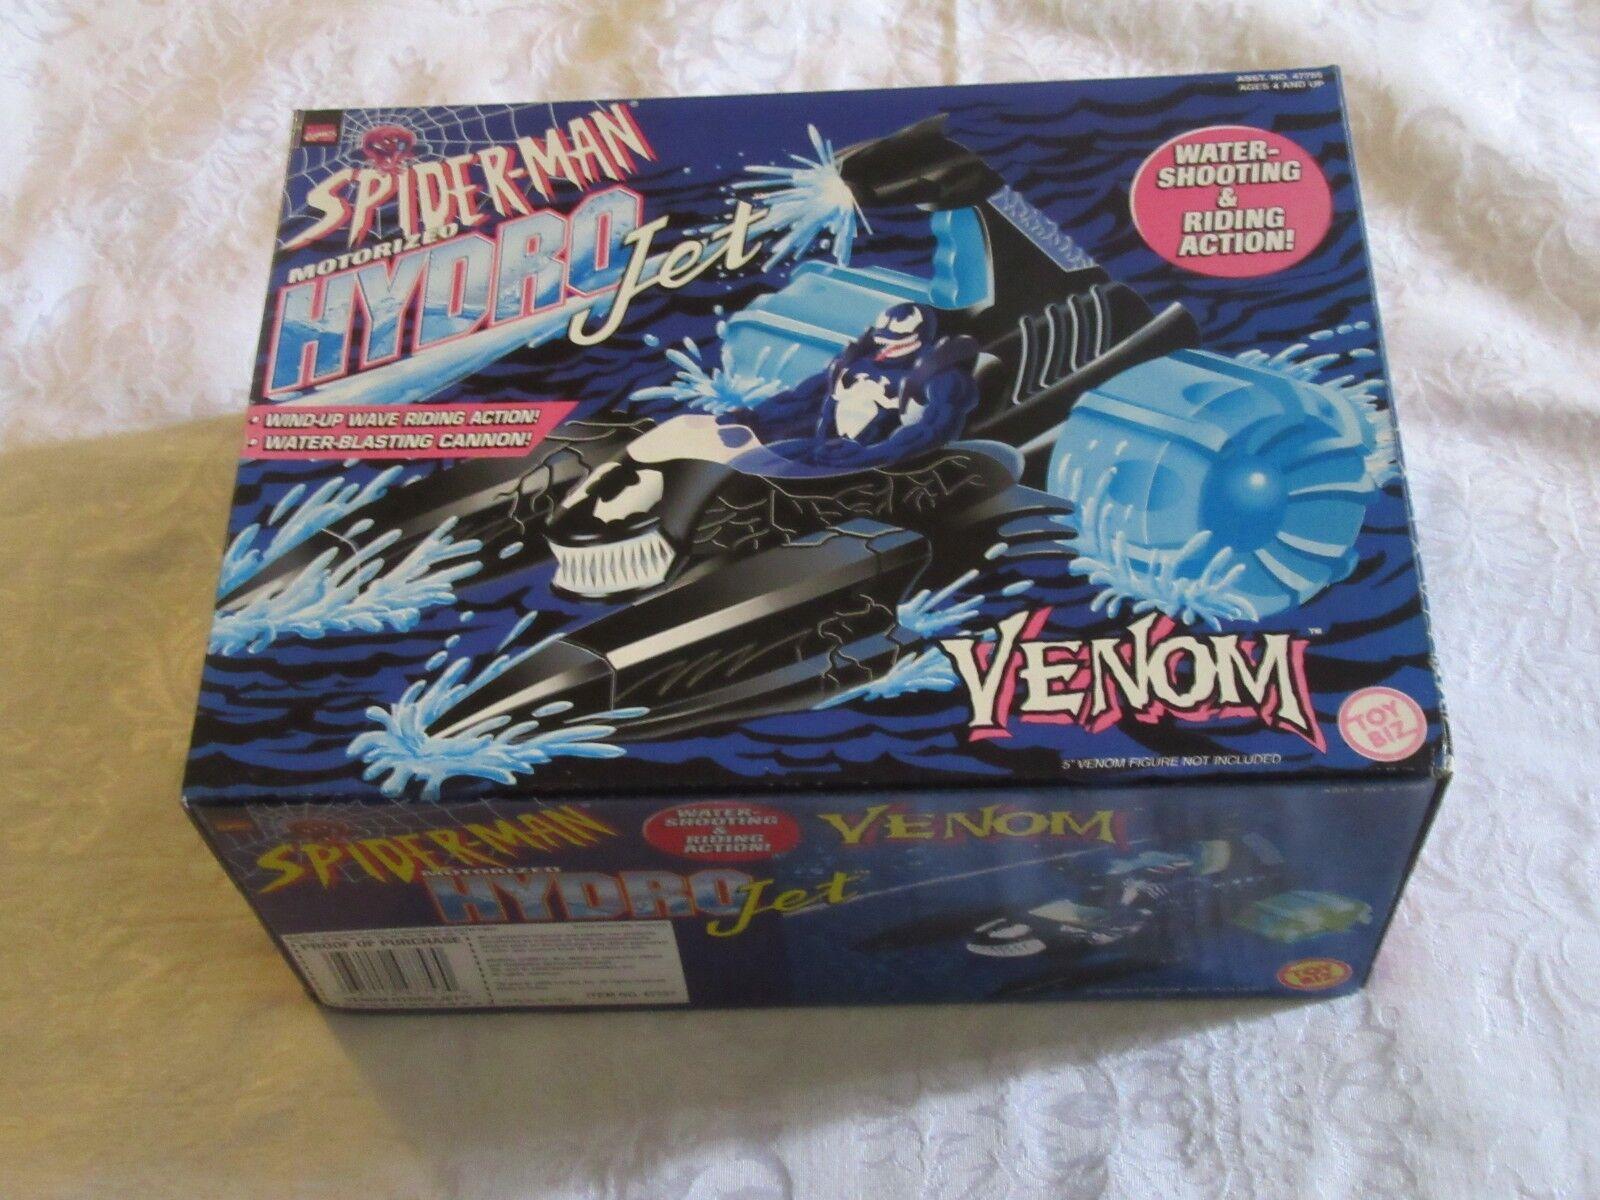 ToyBiz Marvel Comics Spider-Man Motorized Hydro Jet Hydrojet Venom Faded Box